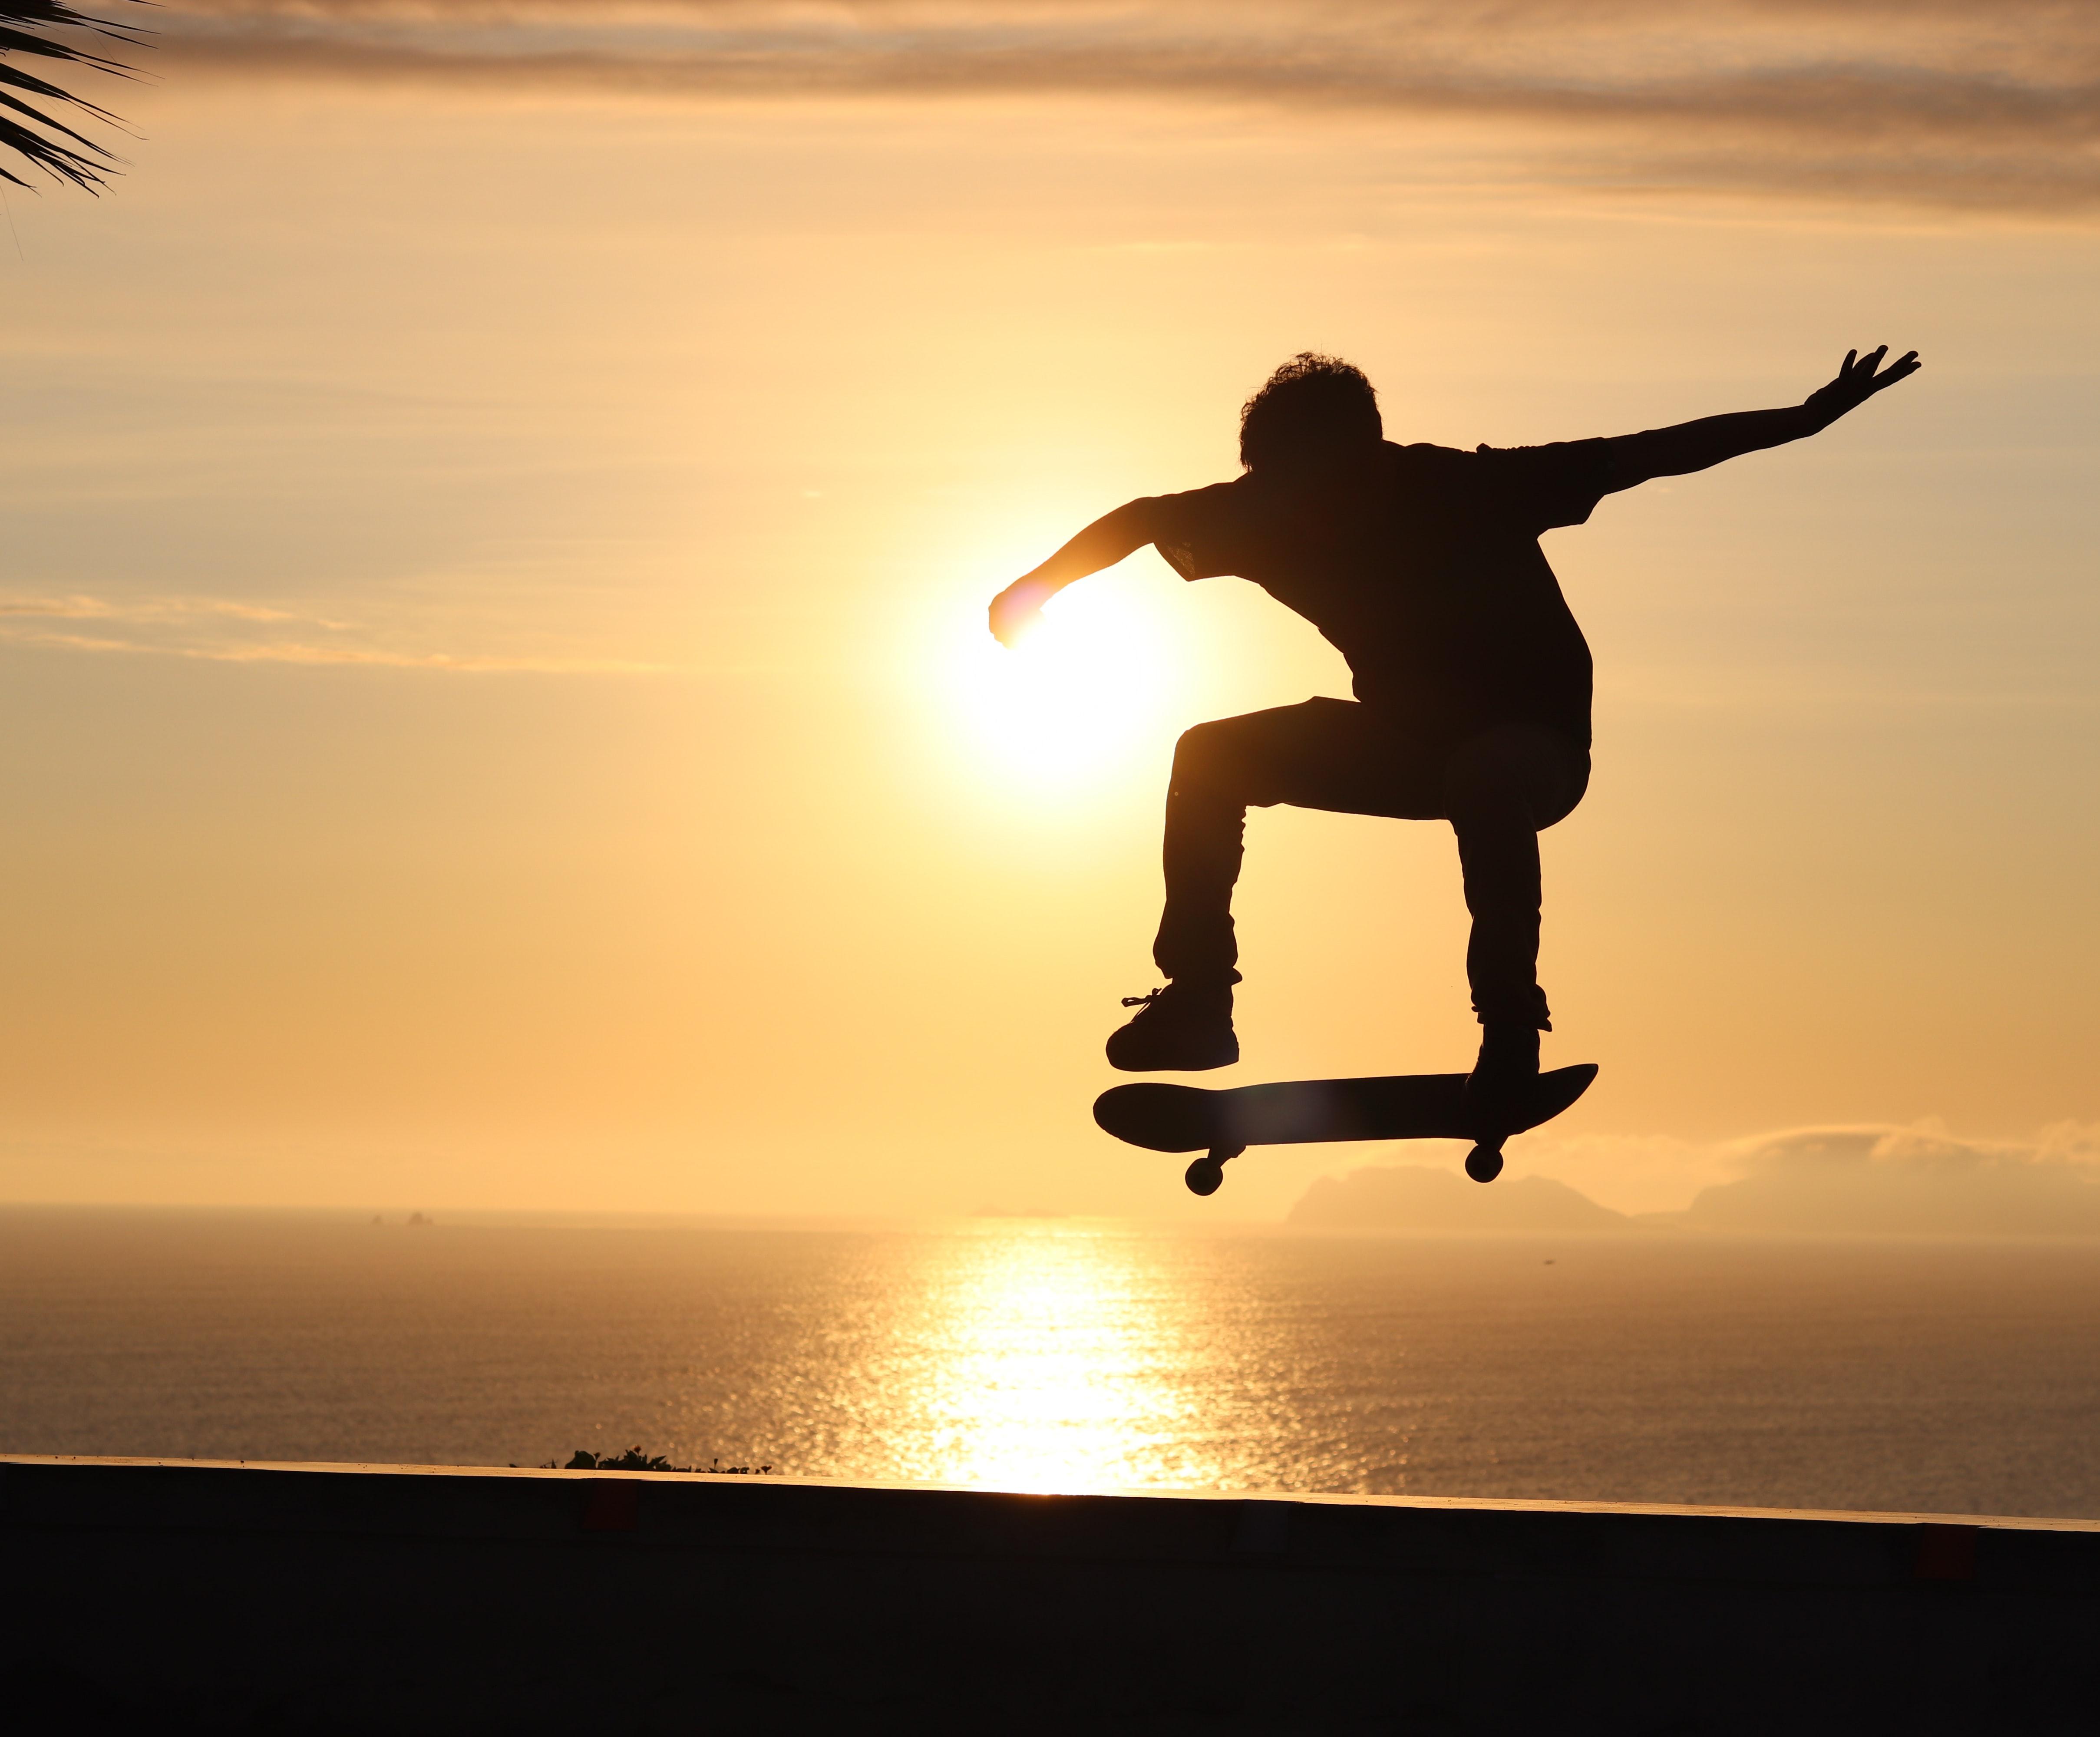 114580 скачать обои Спорт, Скейтборд, Скейт, Скейтер, Трюк, Силуэт, Закат - заставки и картинки бесплатно